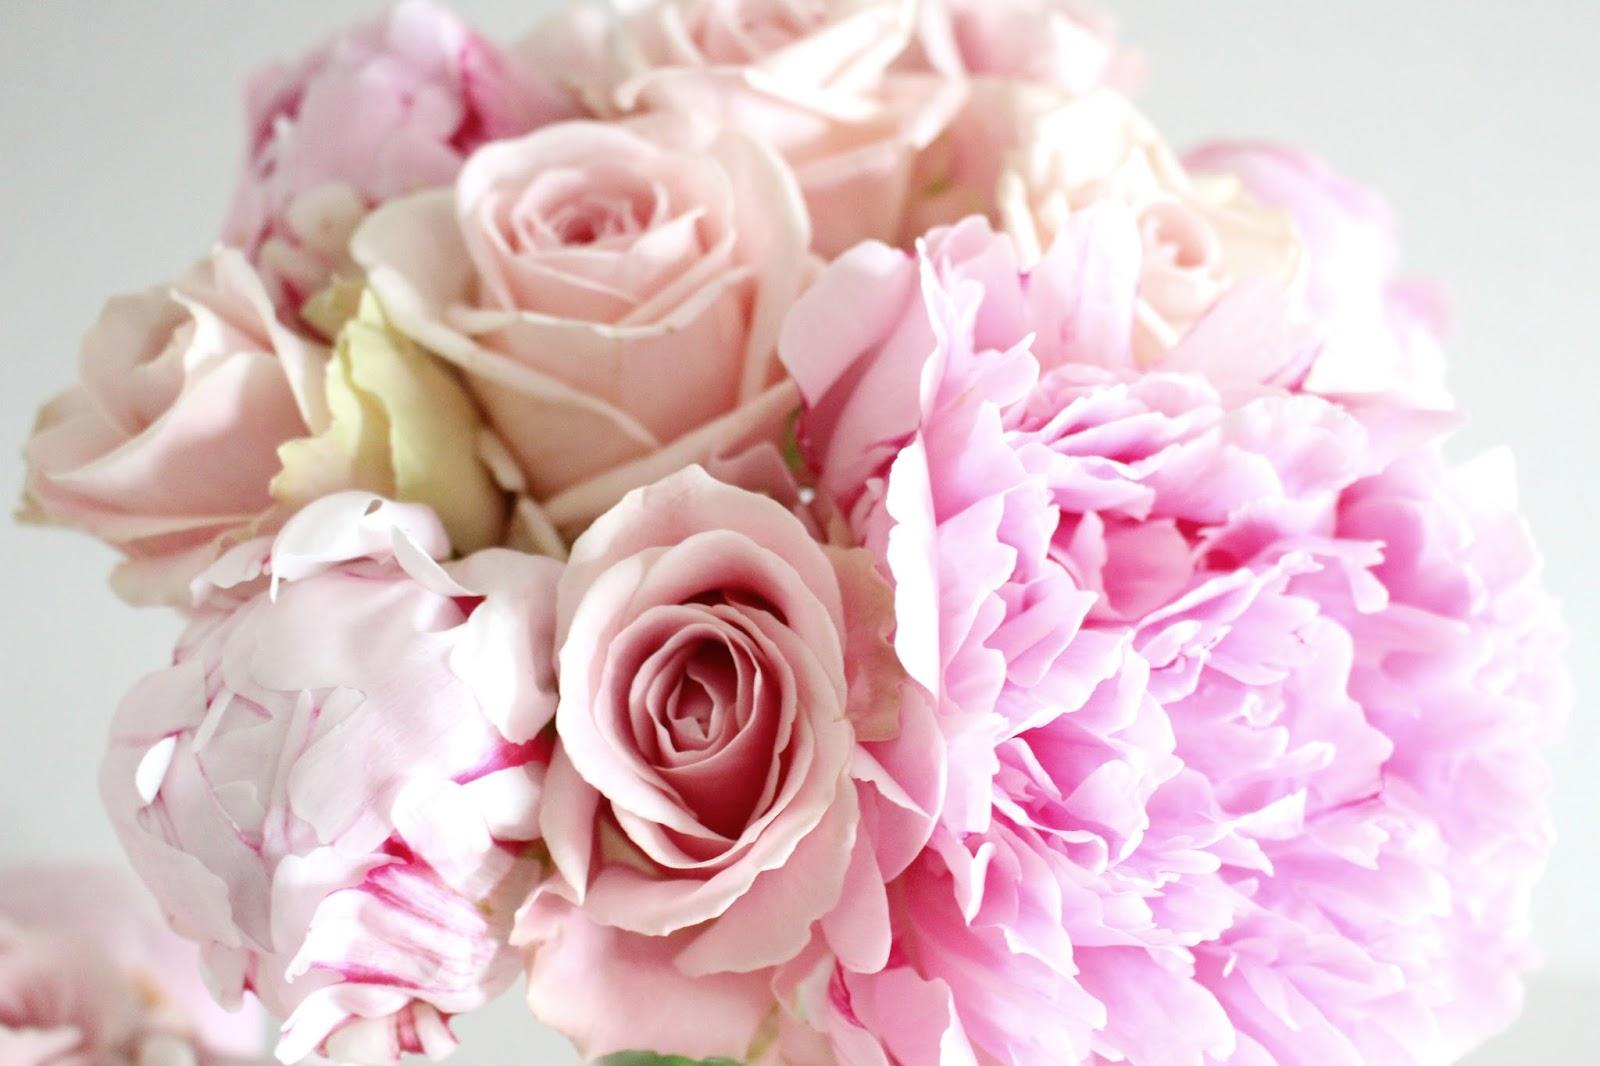 Fleuriste mariage Lyon. Camaïeu de roses